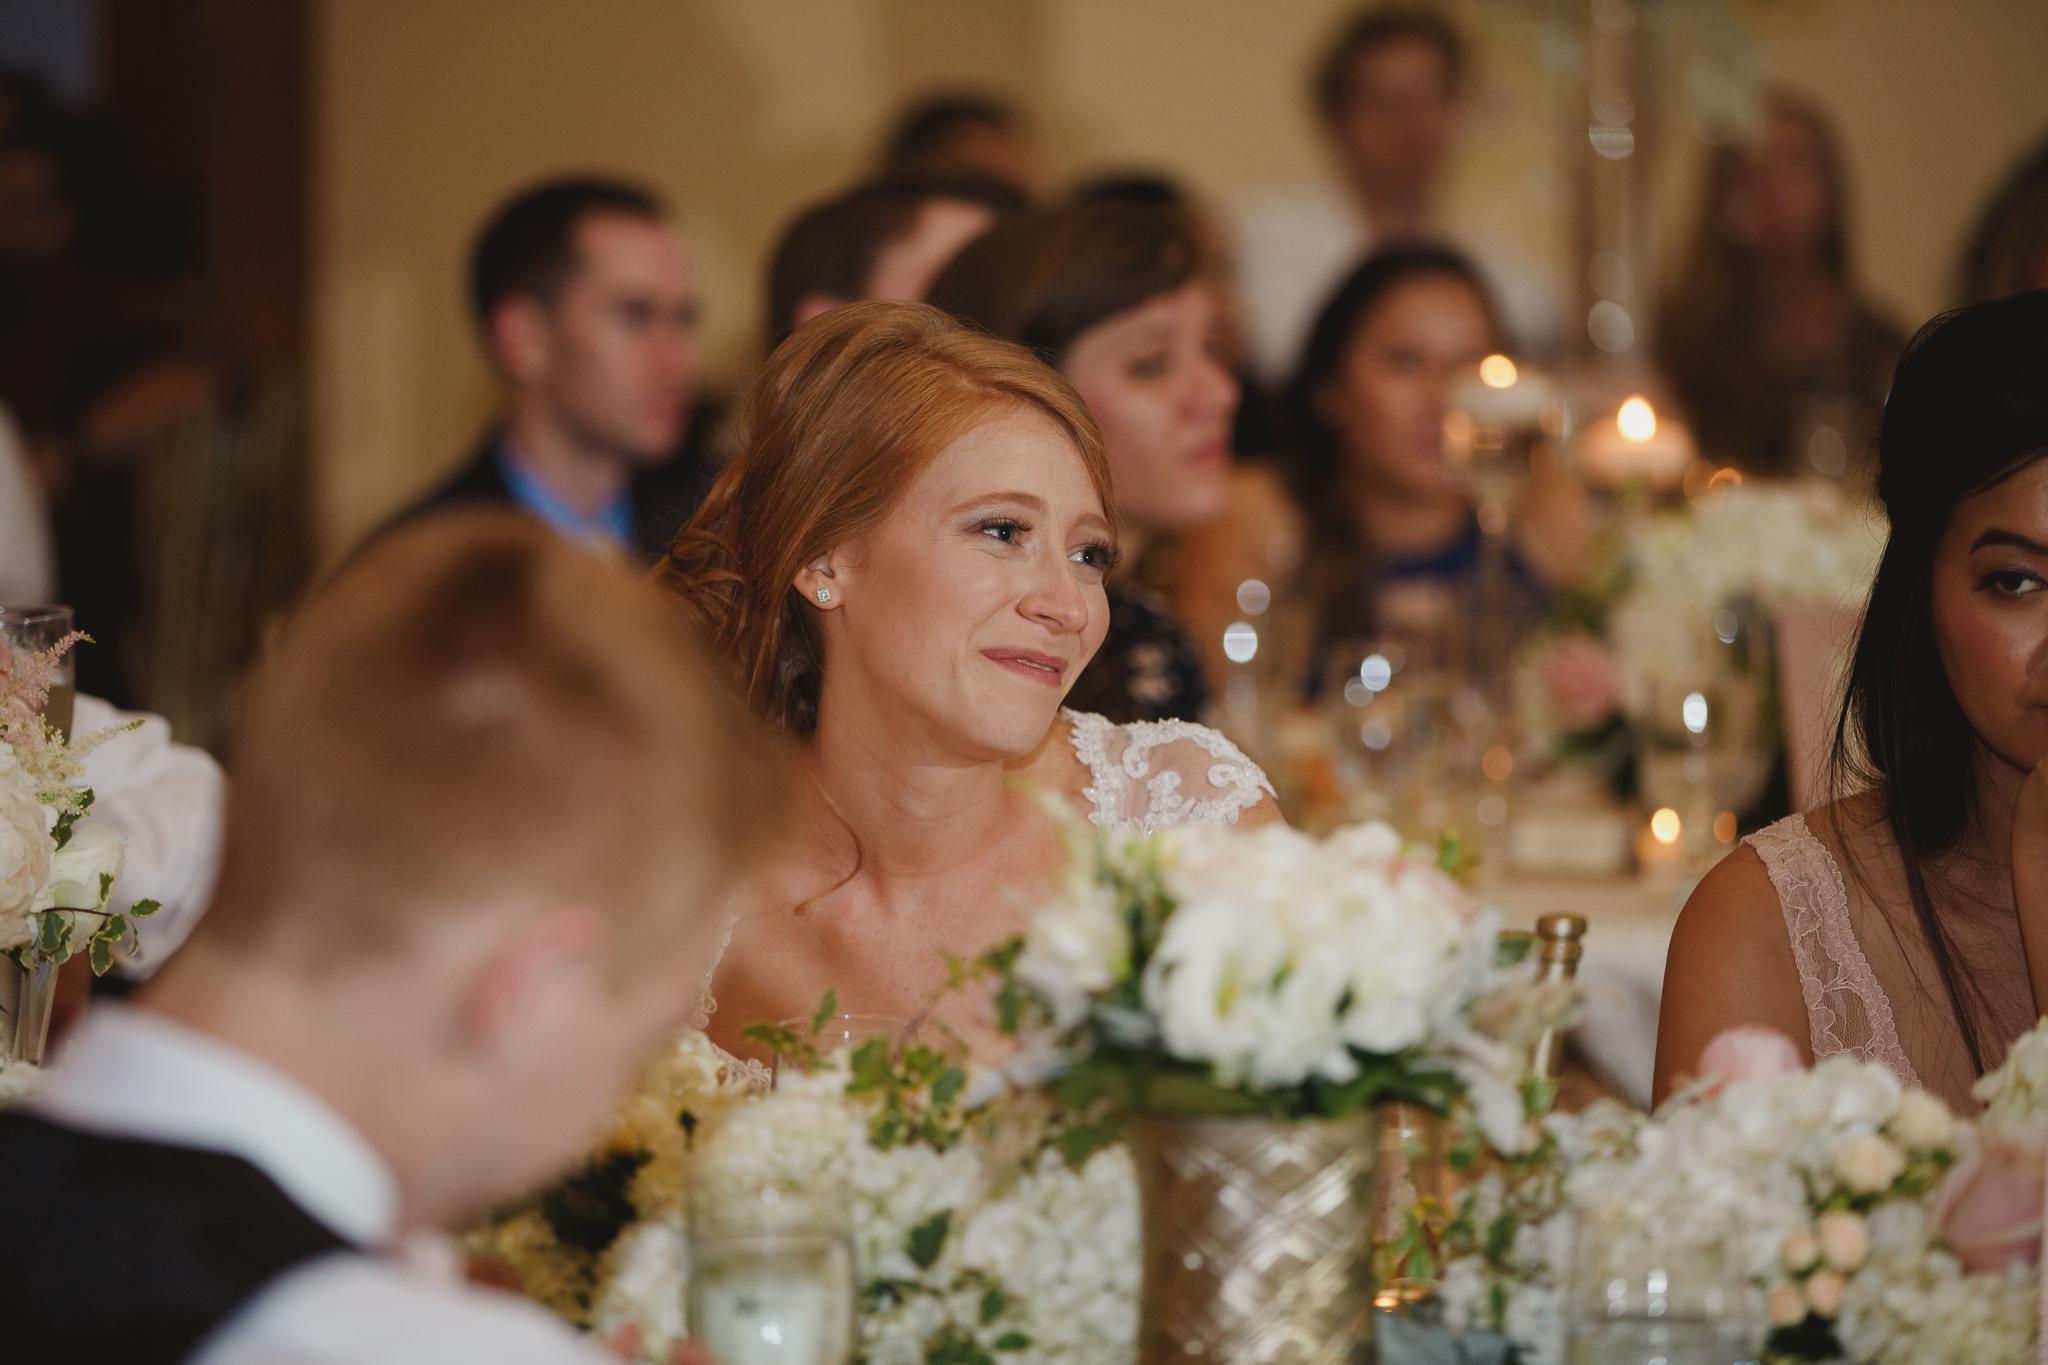 Michael and Kelly - the ashton depot - wedding DFW - wedding photographer- elizalde photography (100 of 150).jpg